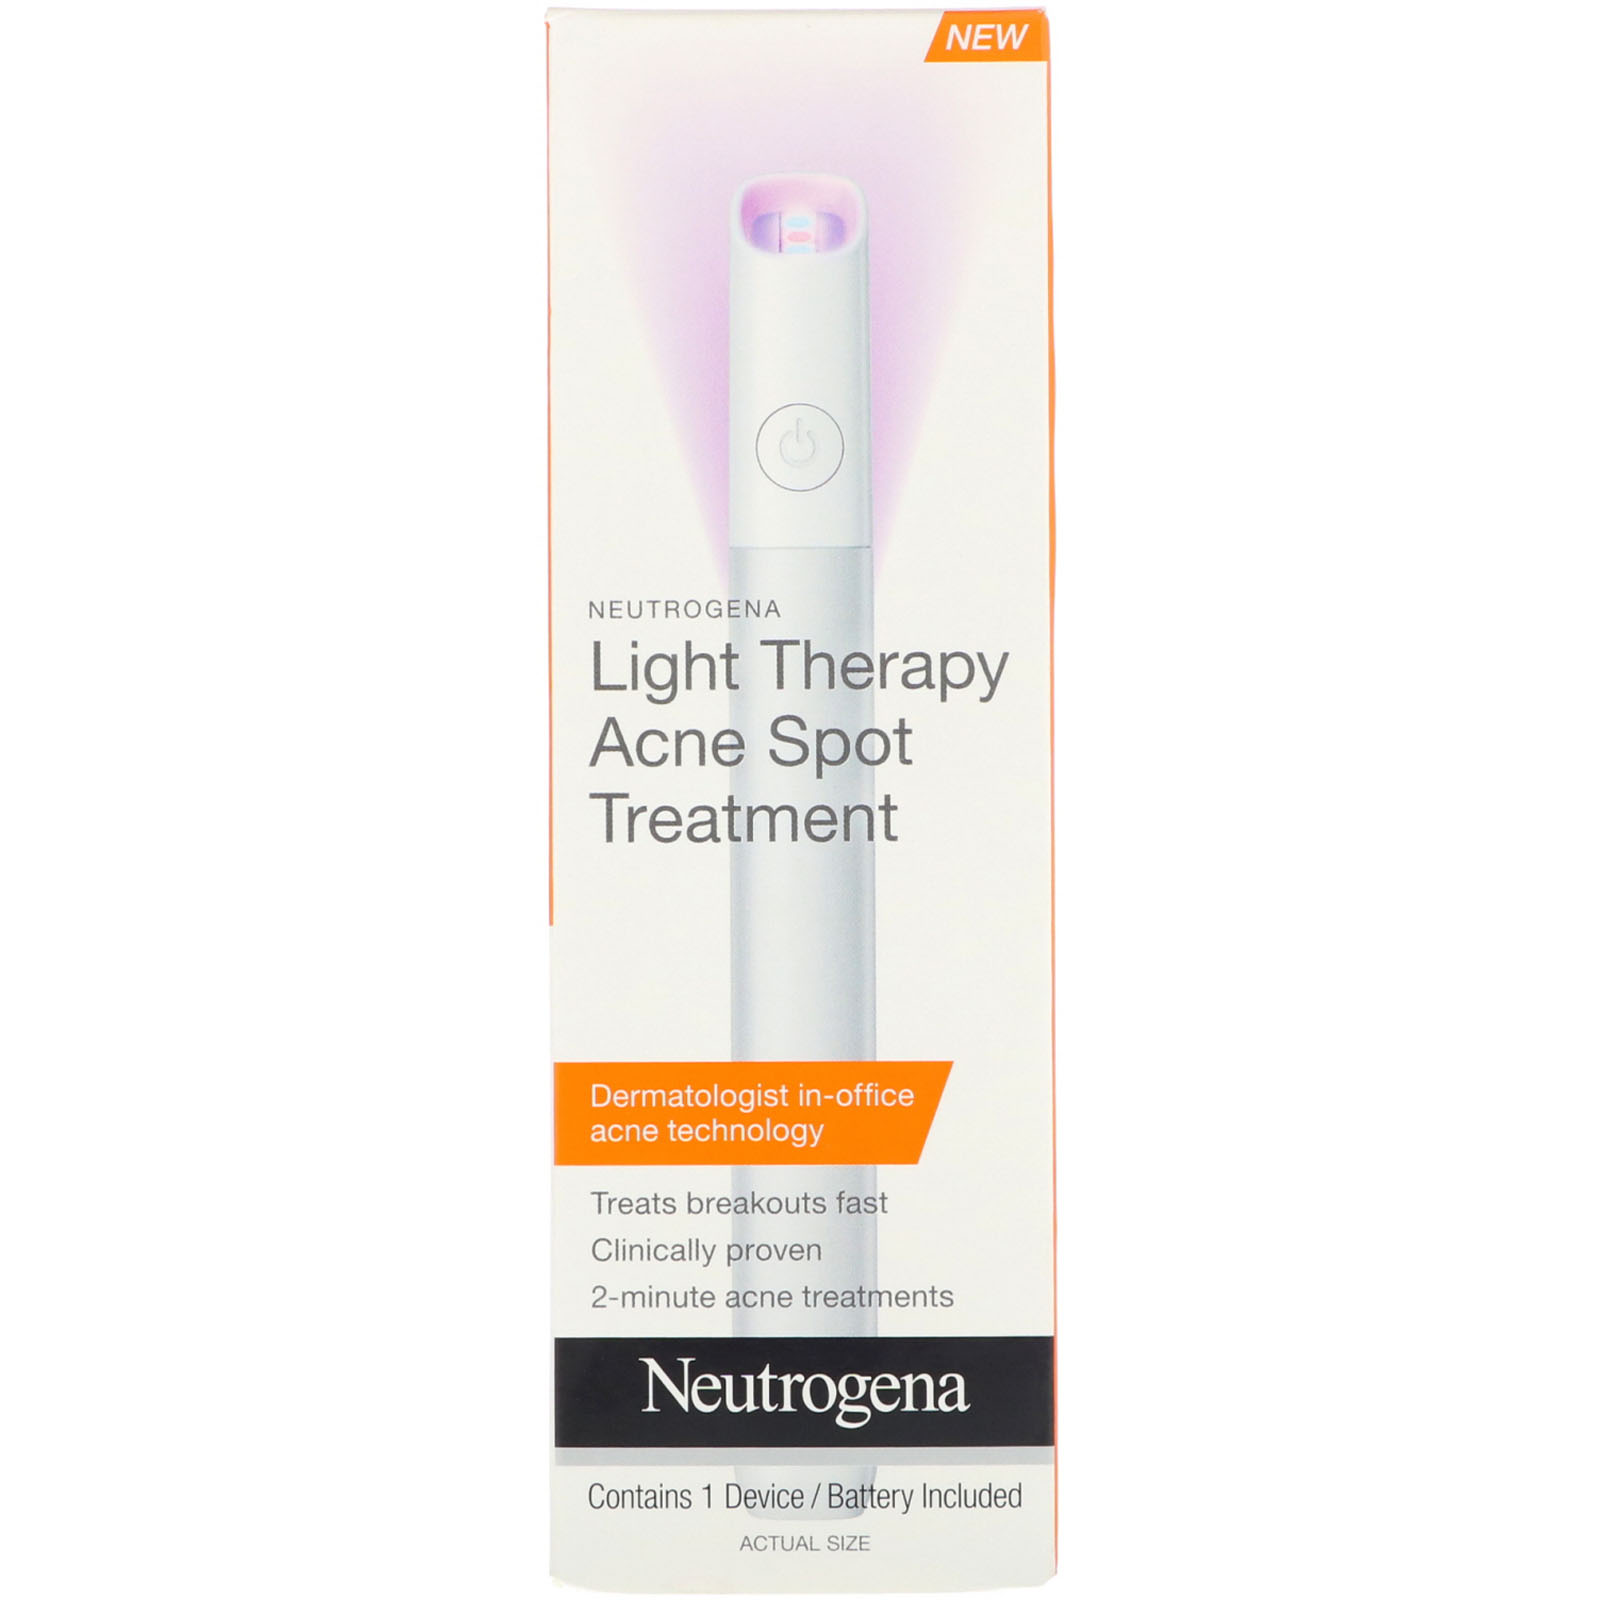 Neutrogena Light Therapy Acne Spot Treatment 1 Device Iherb